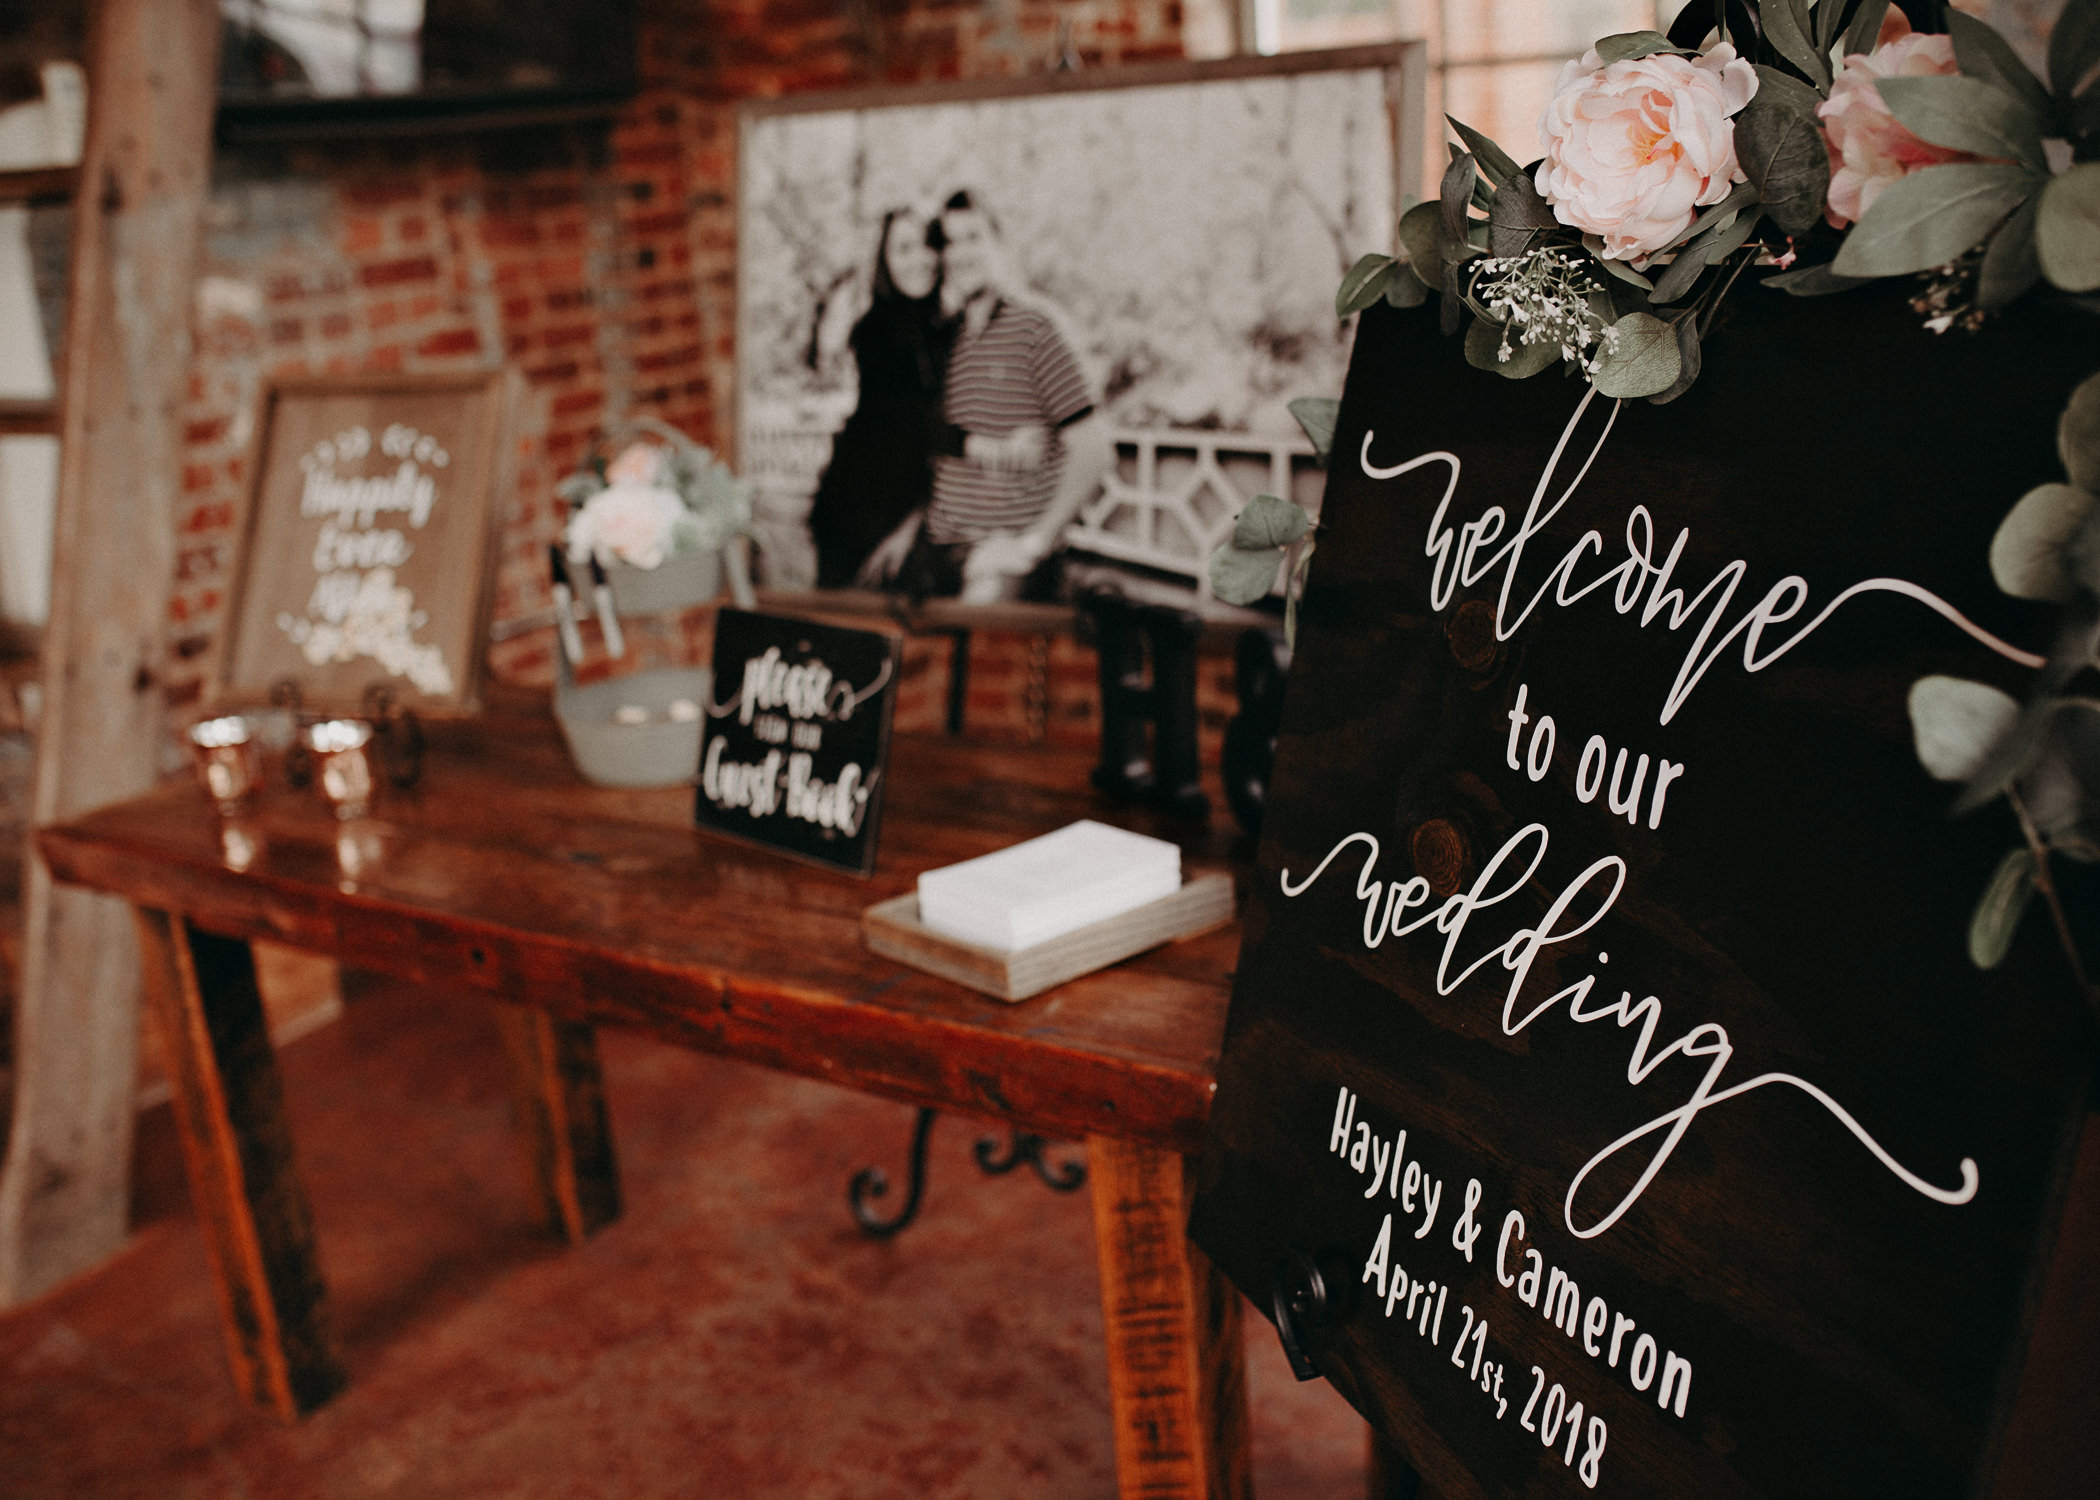 37 4 - Atlanta Wedding Photographer - The engine room - Ga - Wedding trends - Aline Marin Photography.jpg